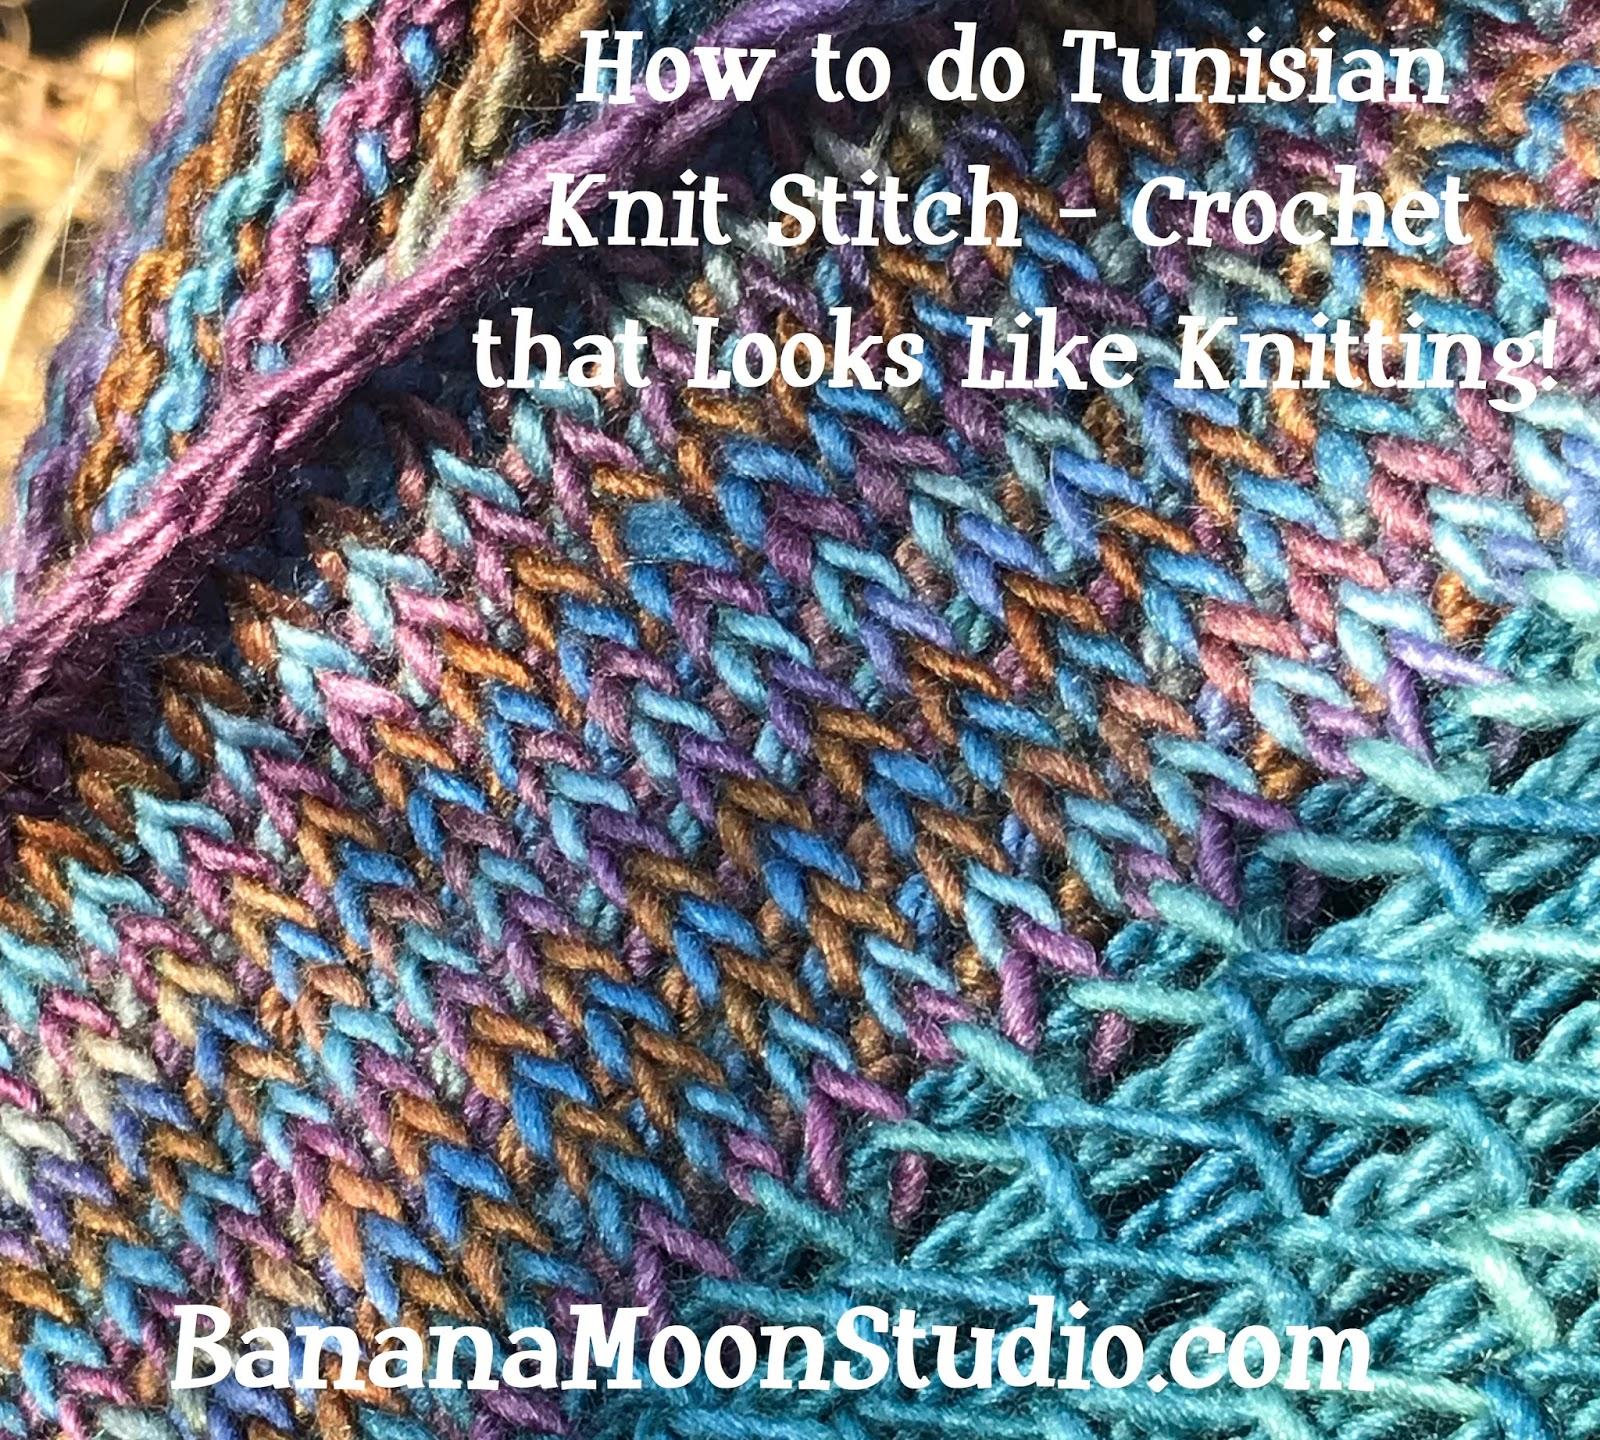 Knitting Yarn Bdo : Banana moon studio